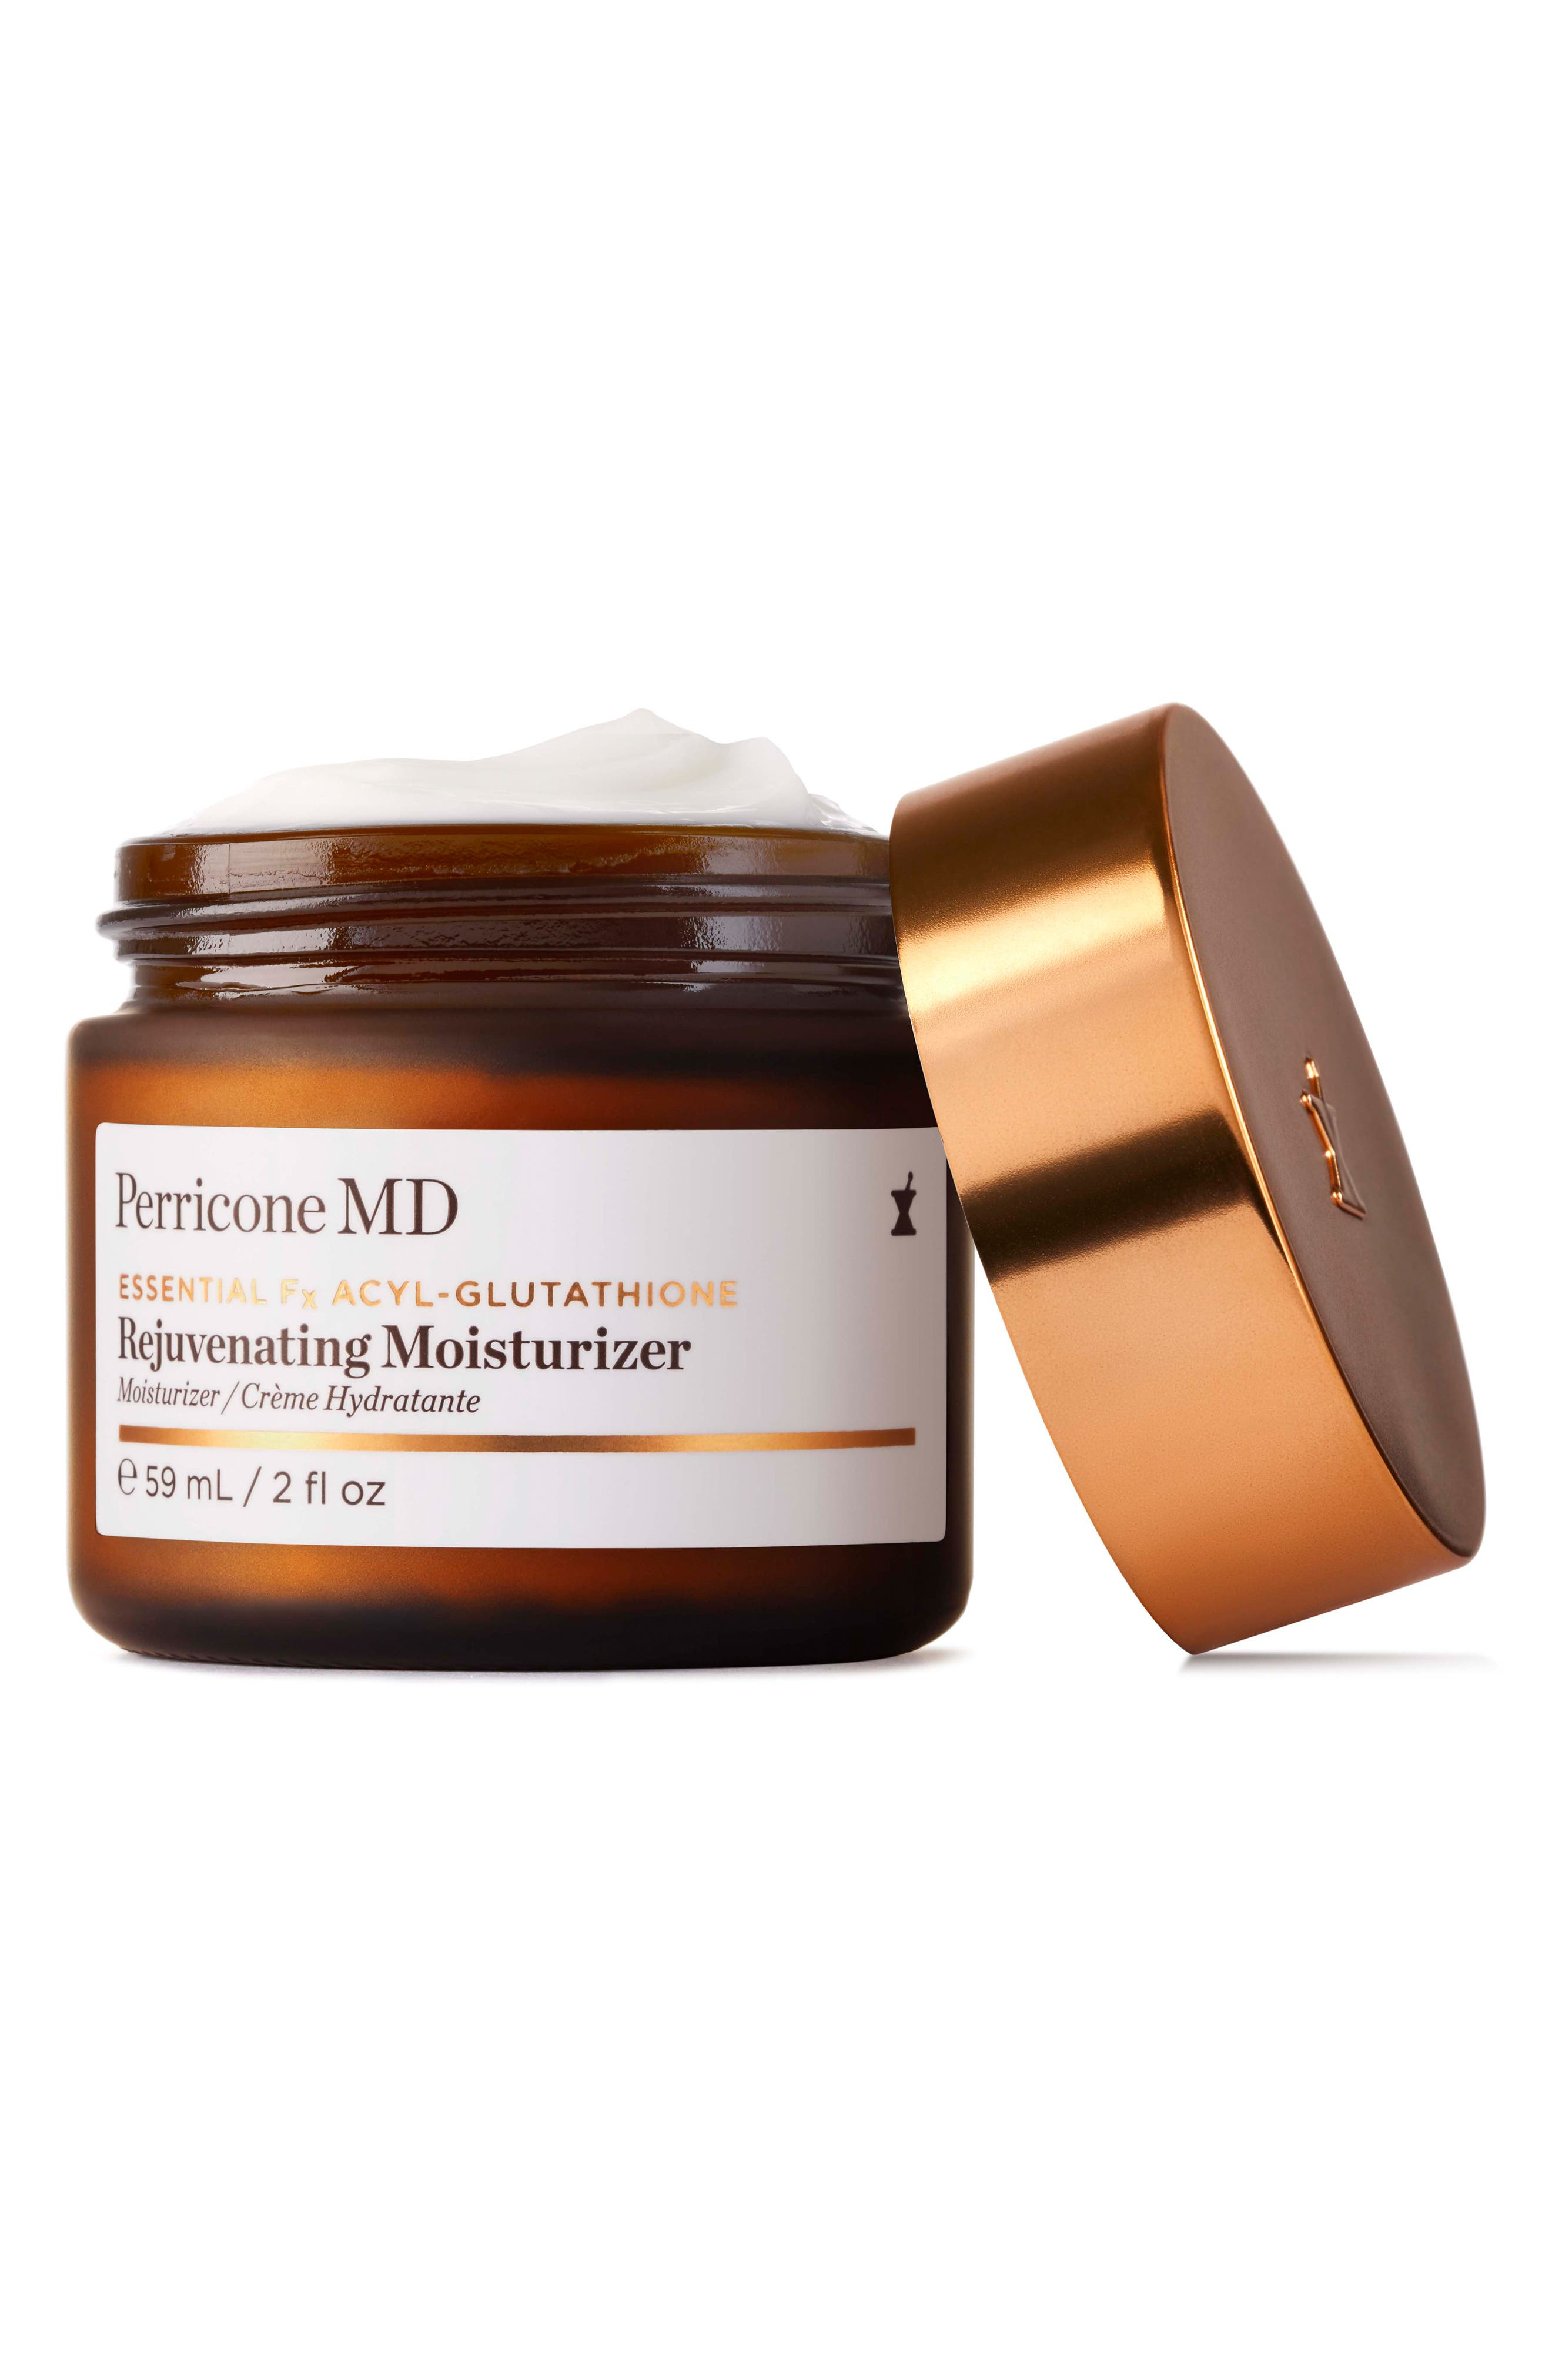 PERRICONE MD, Essential Fx Acyl-Glutathione Rejuvenating Moisturizer, Alternate thumbnail 2, color, NO COLOR